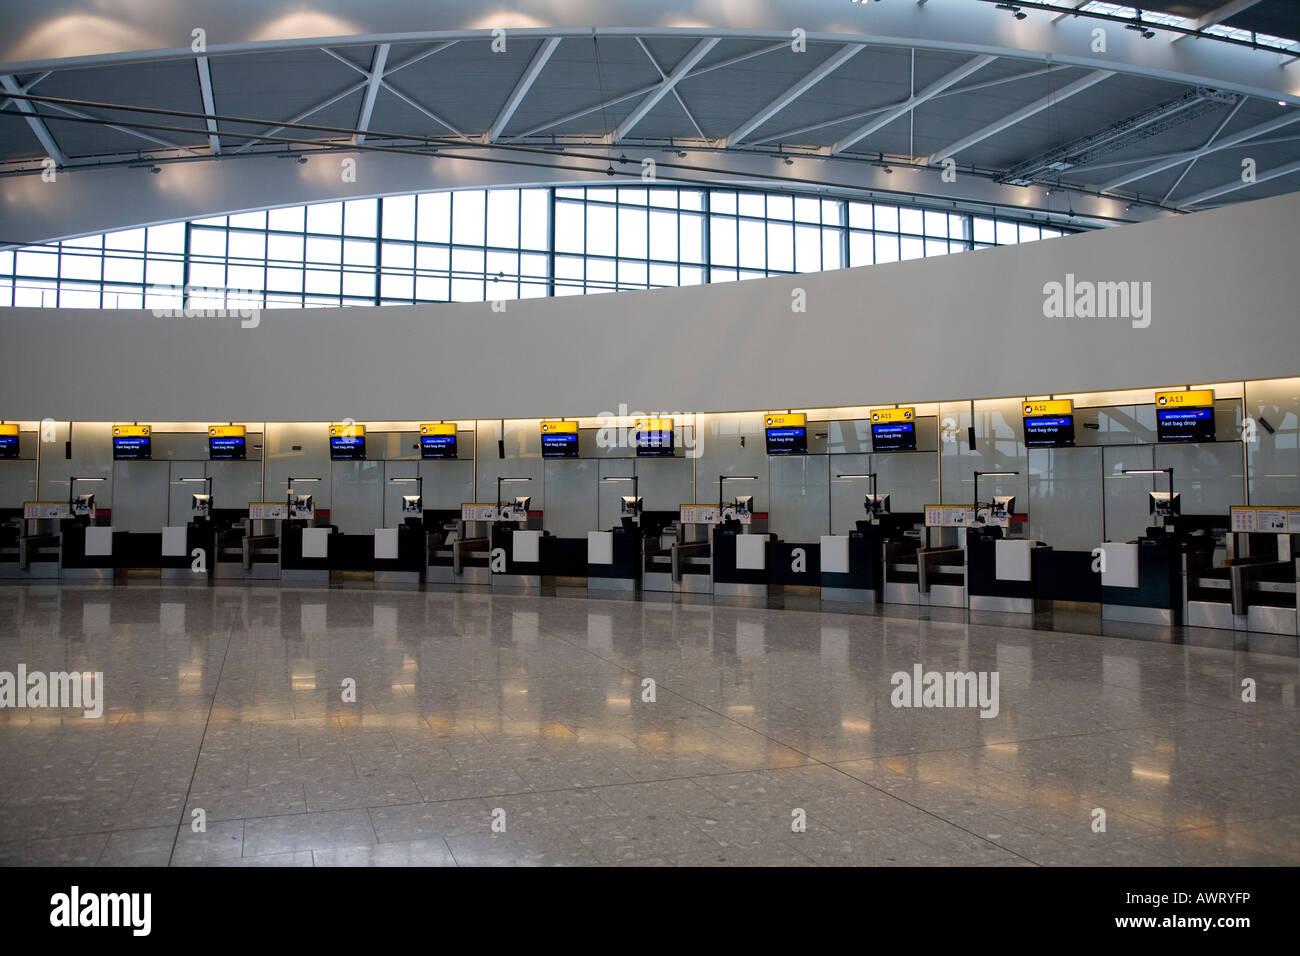 London Heathrow Airport, Terminal 5, London, England, UK - Stock Image